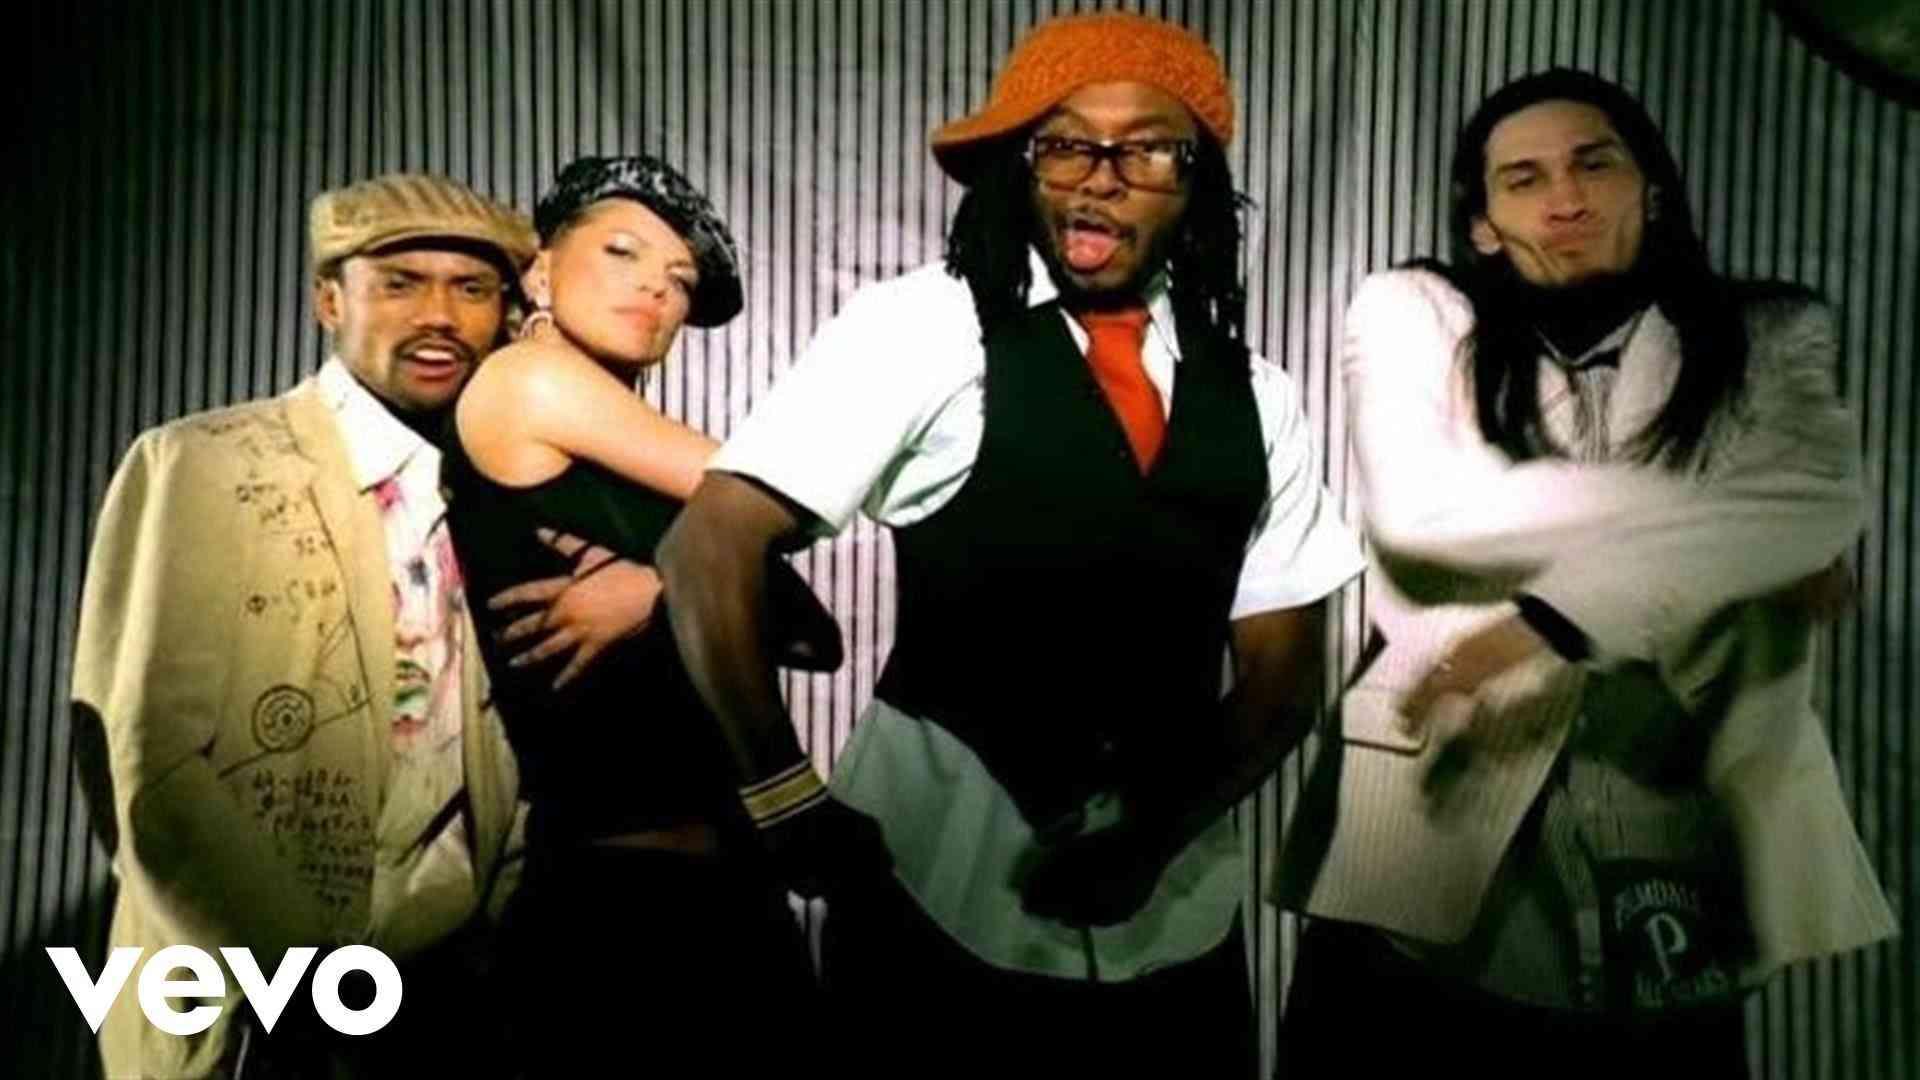 The Black Eyed Peas - Hey Mama - YouTube